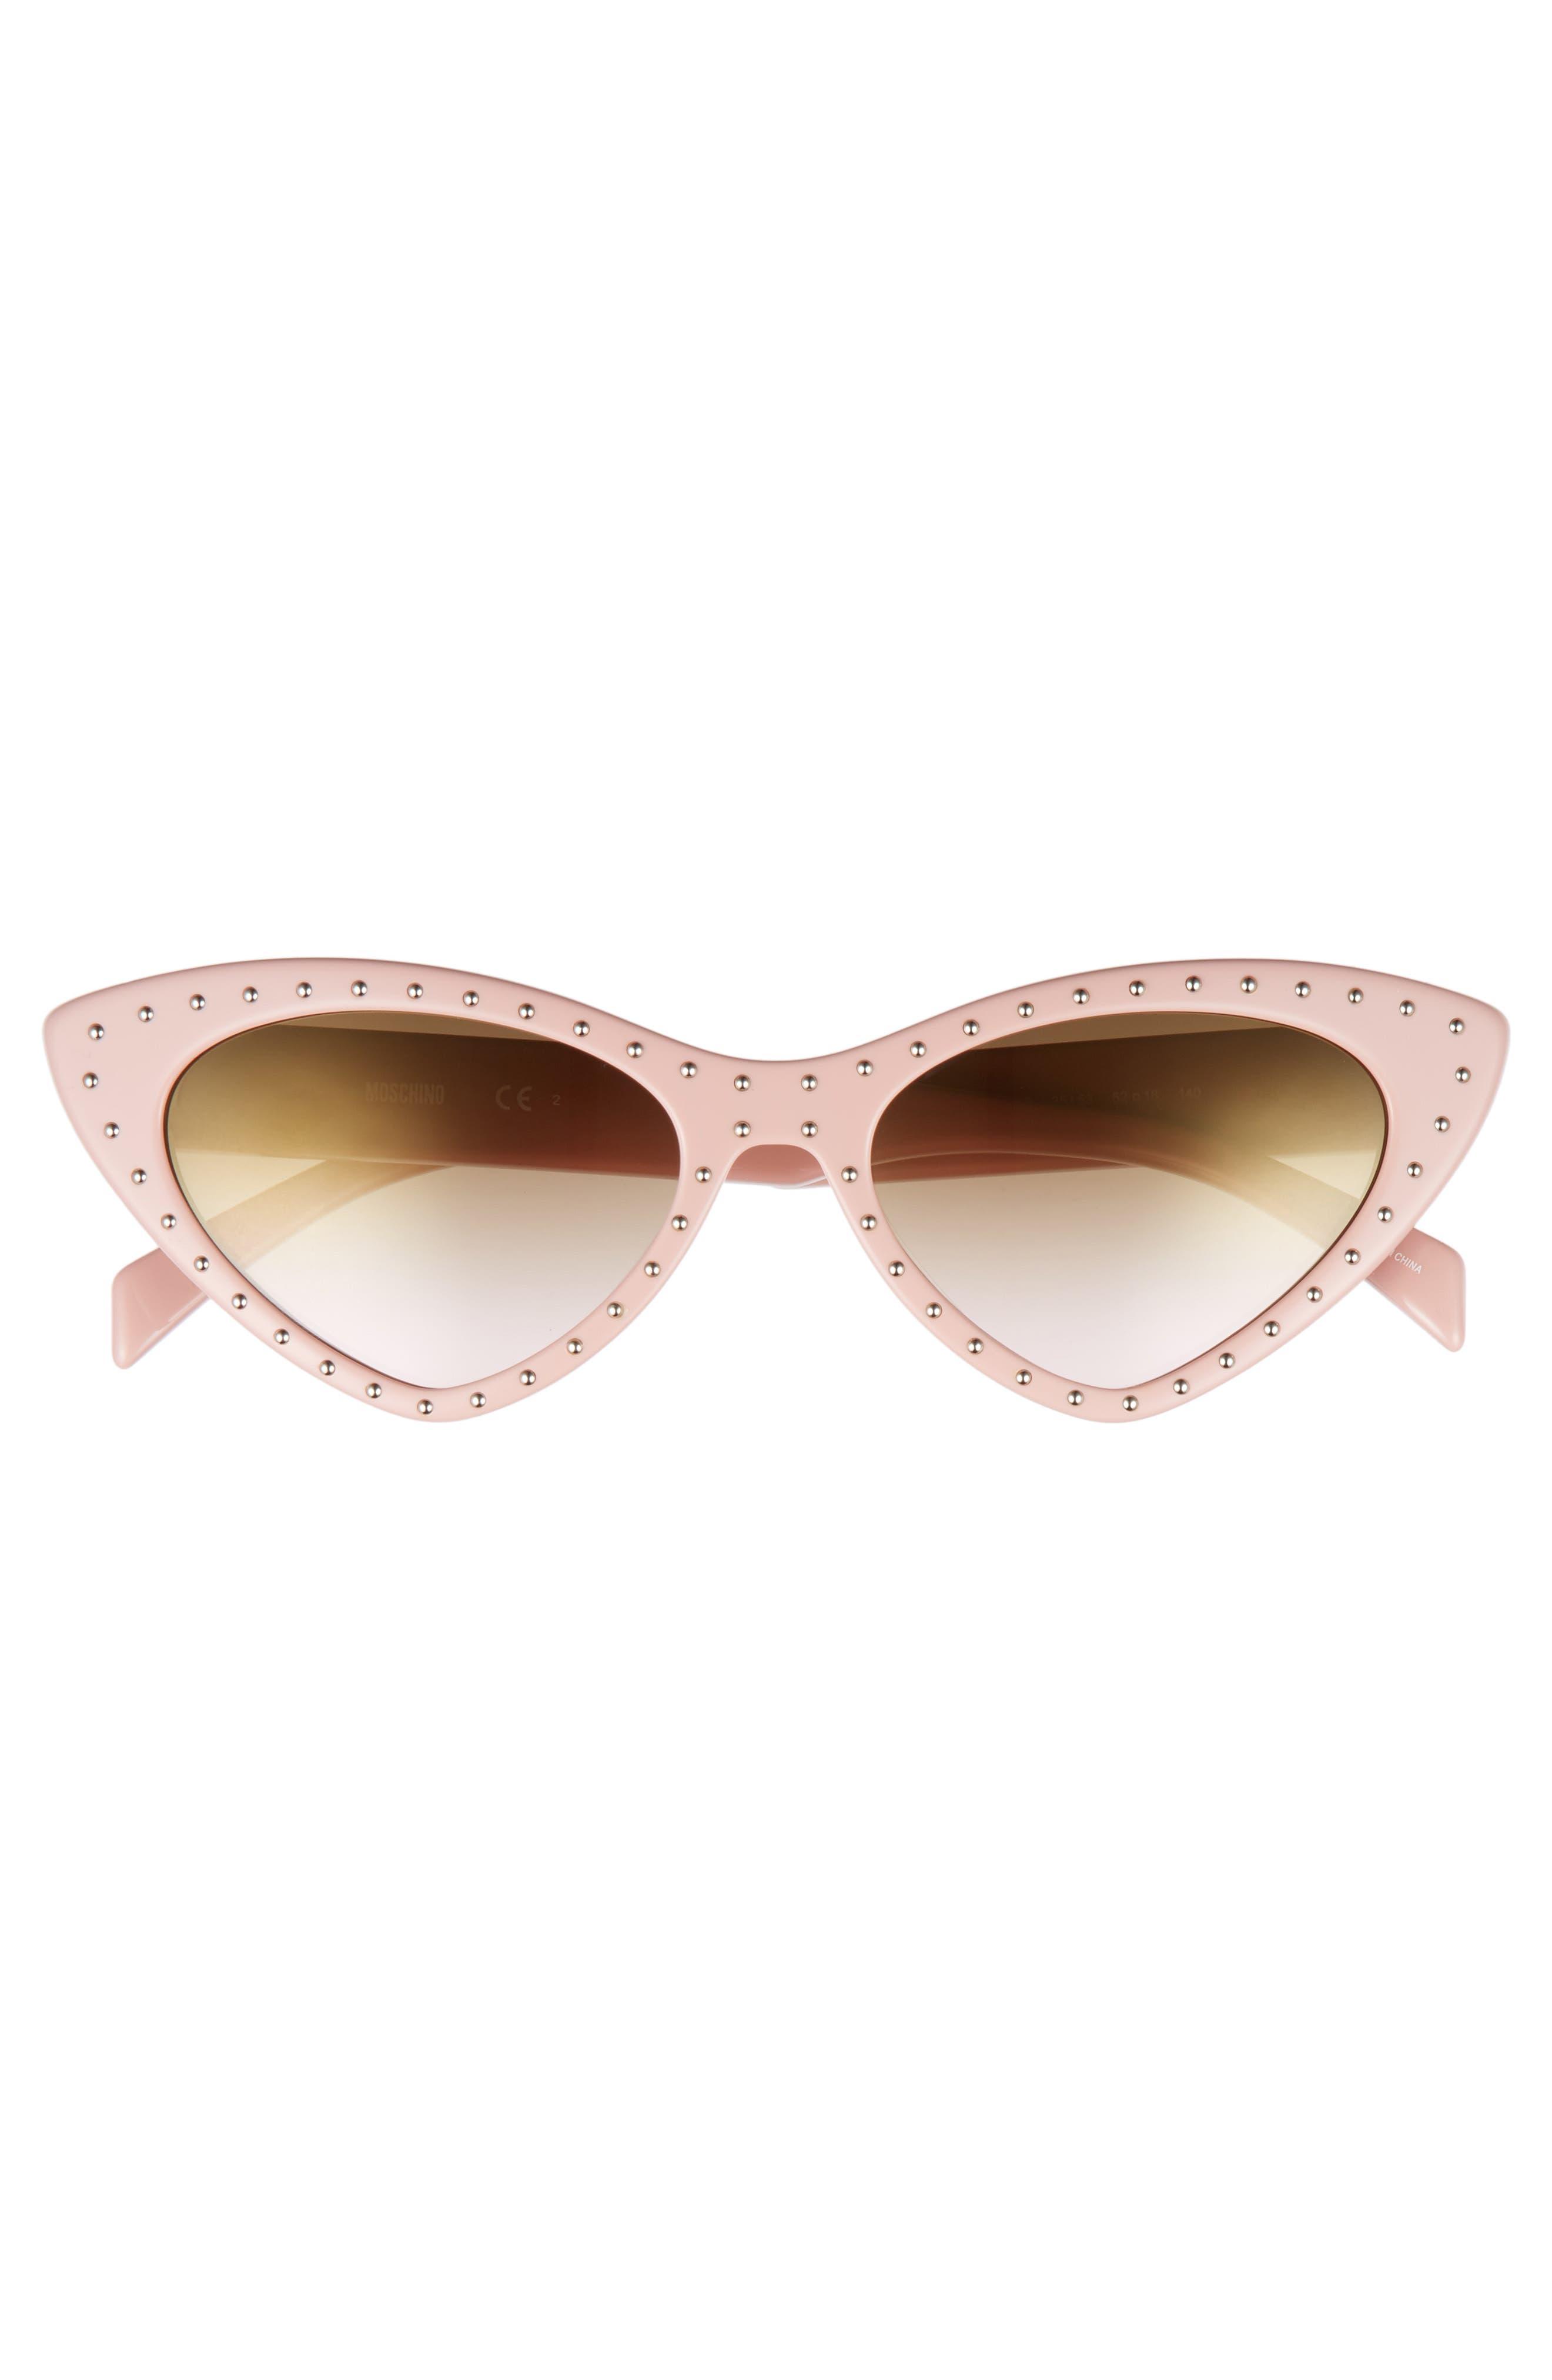 52mm Cat's Eye Sunglasses,                             Alternate thumbnail 3, color,                             PINK